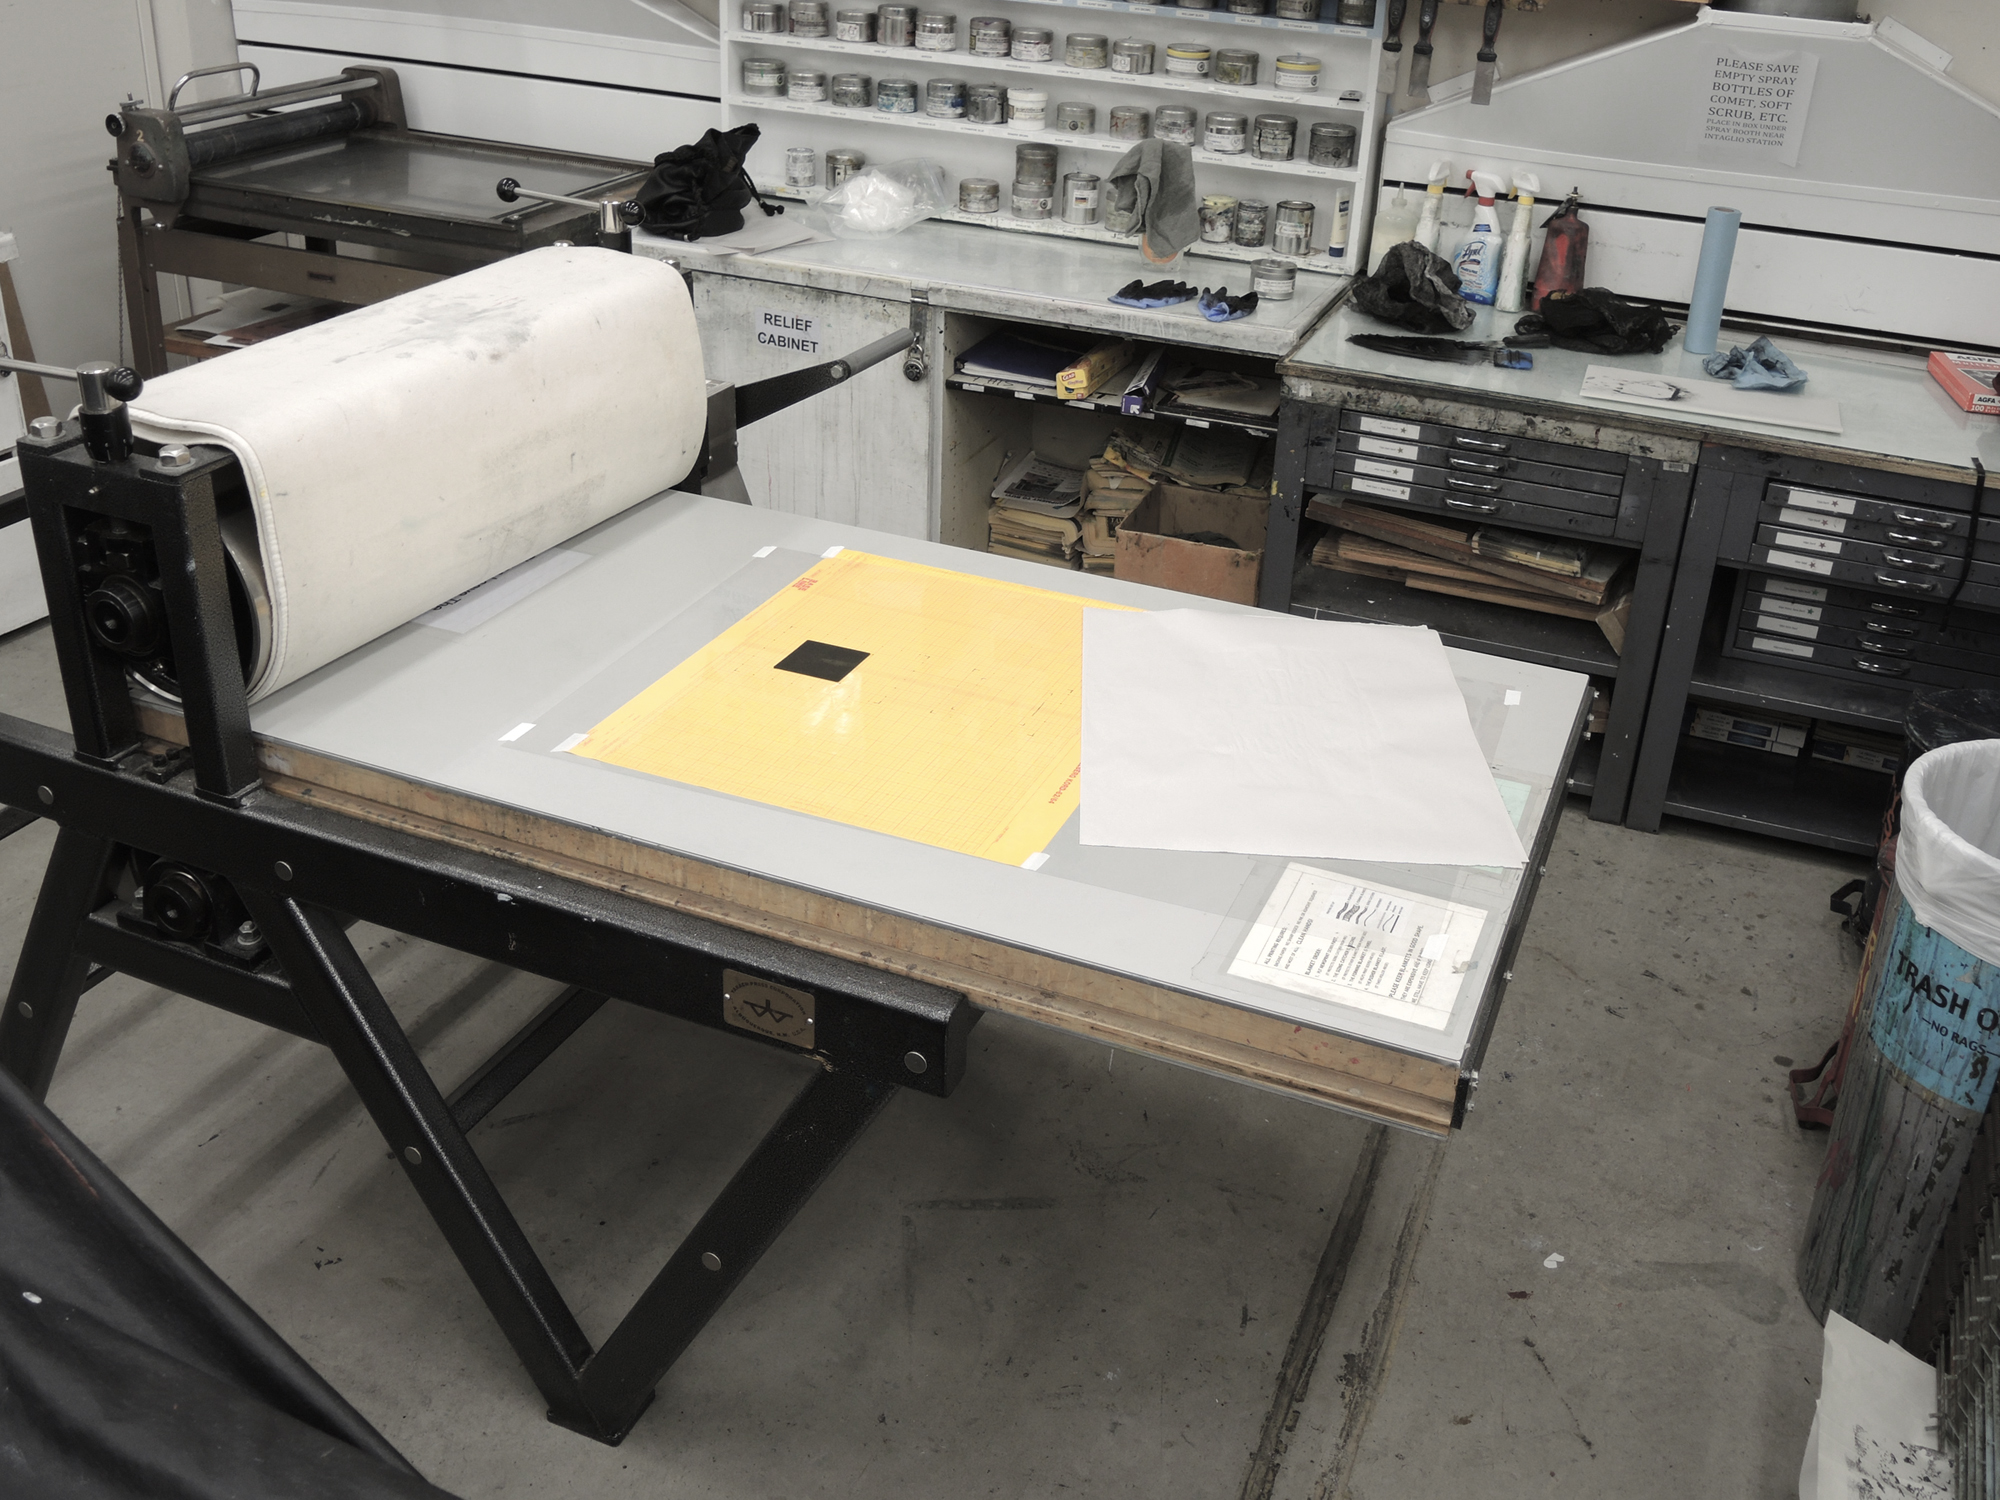 takach press - mcad printmaking studio